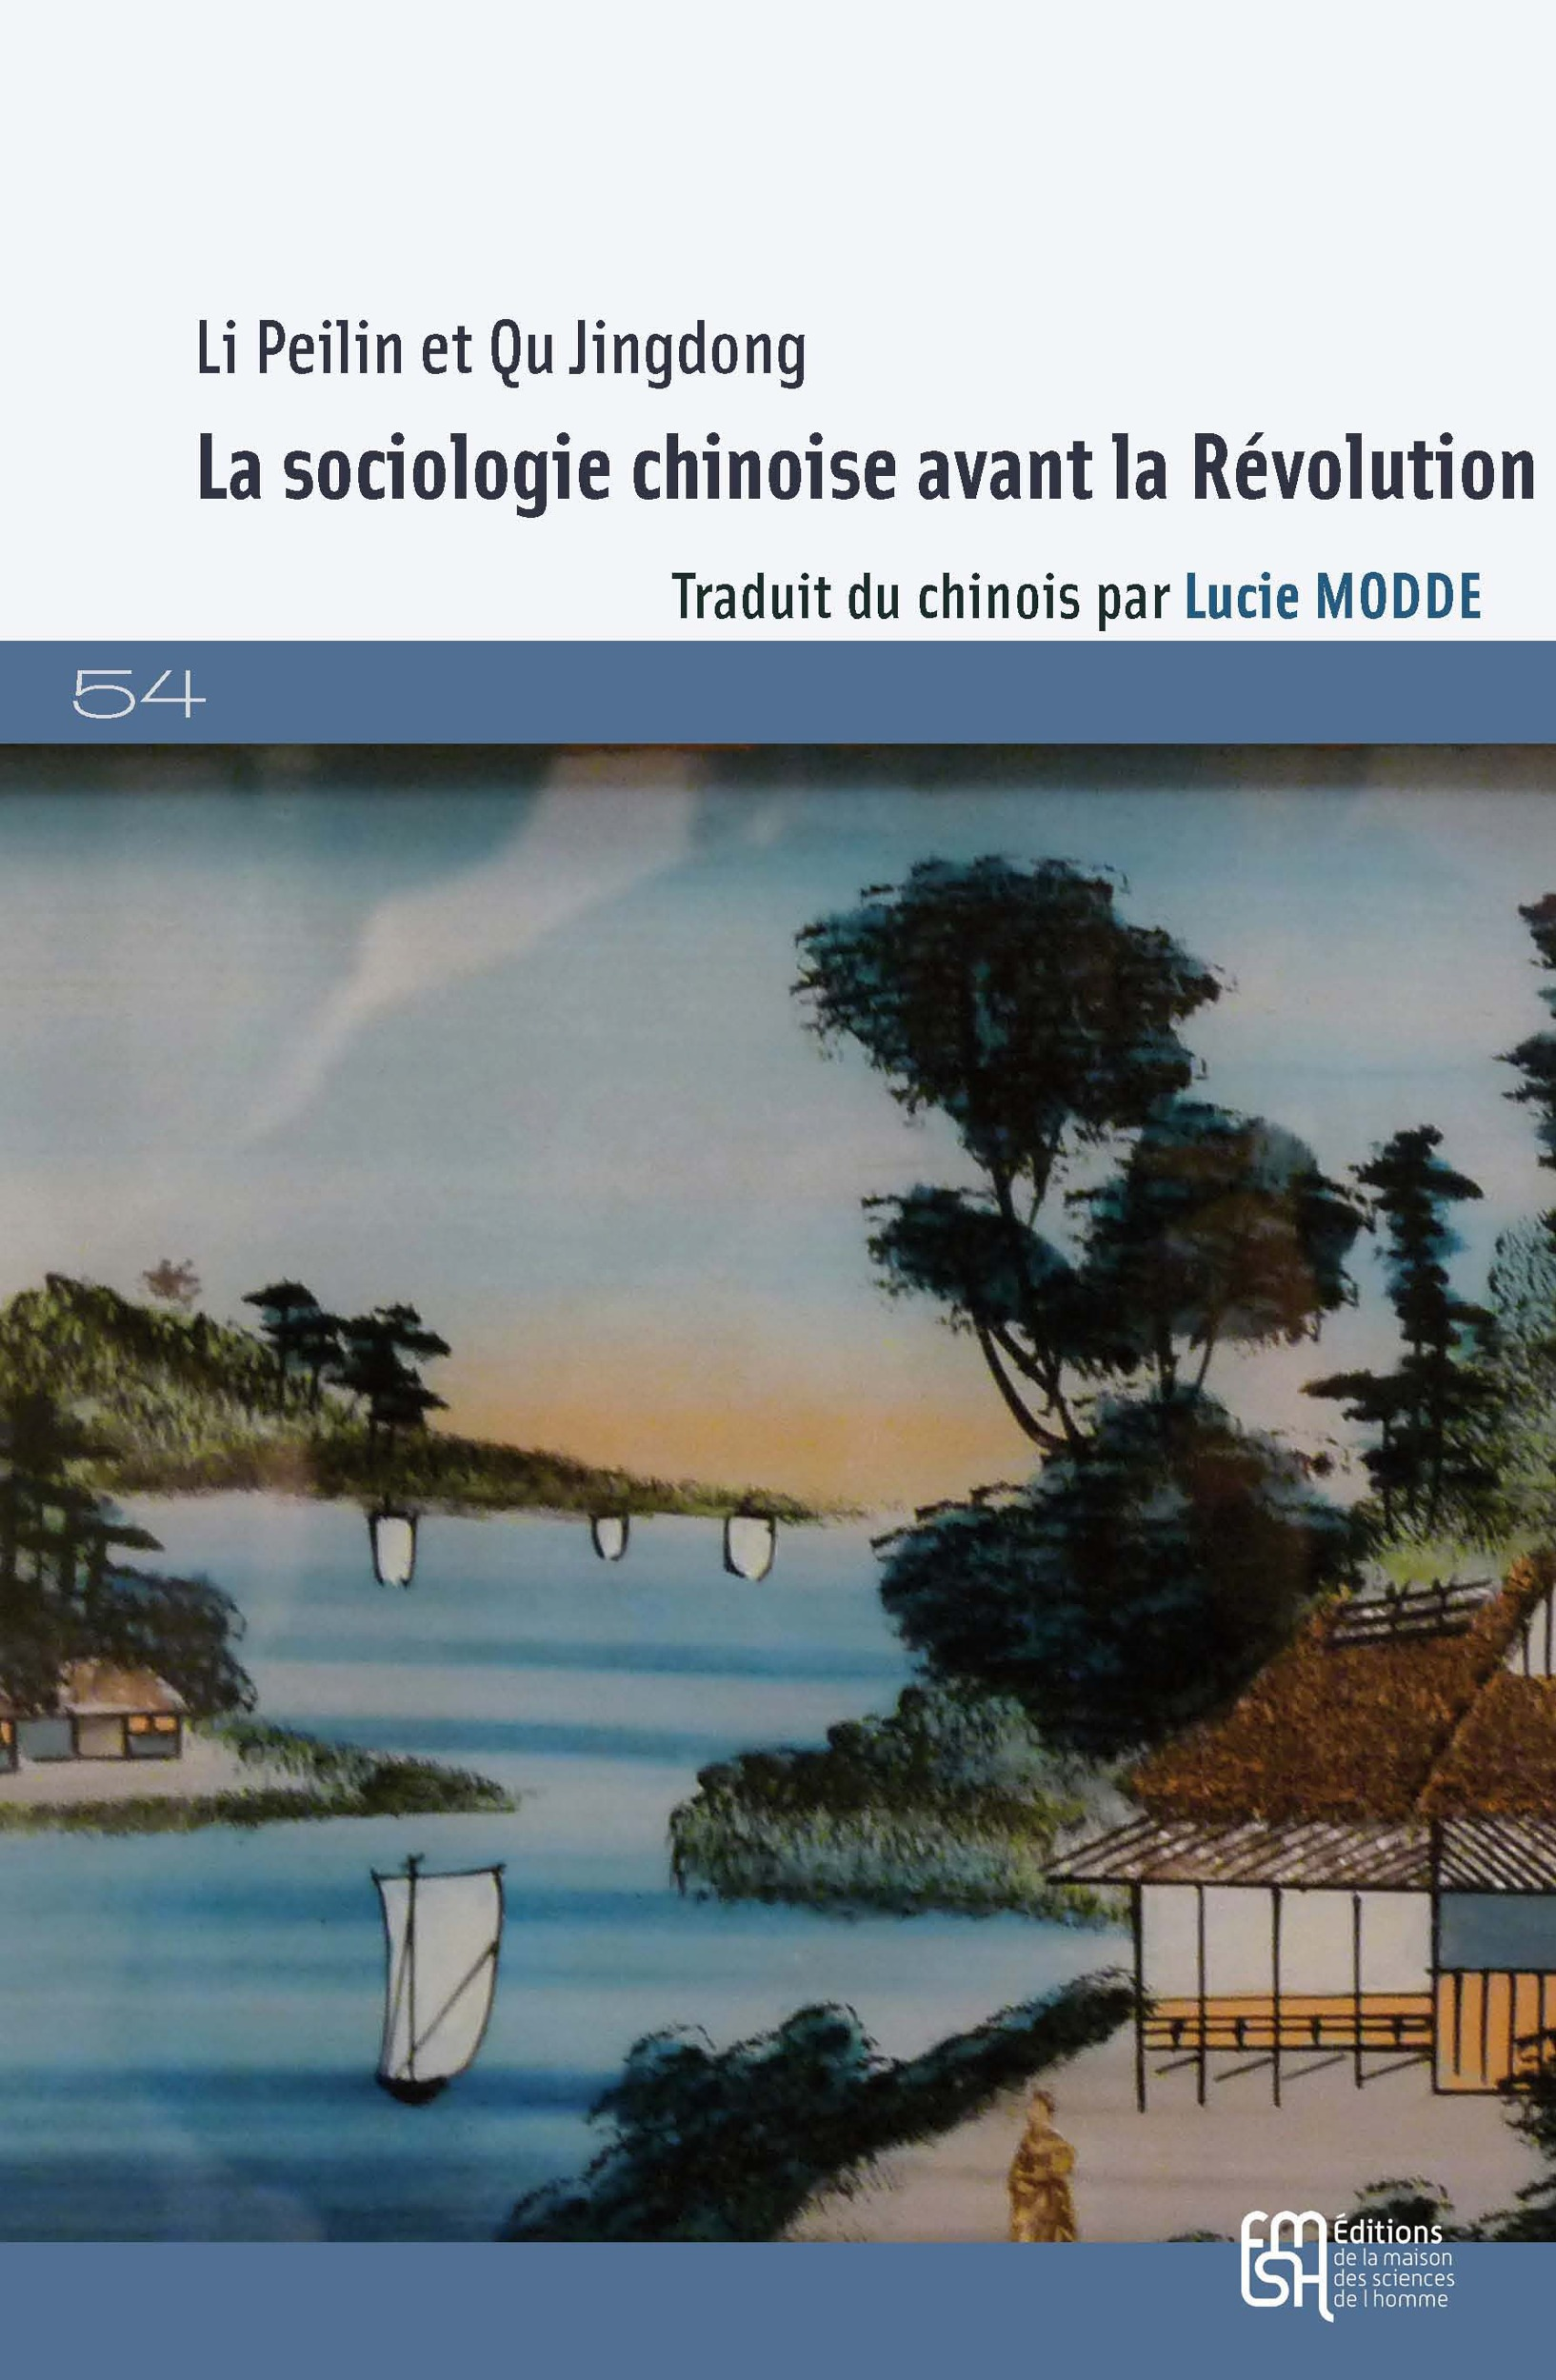 La sociologie chinoise avant la revolution. une introduction  - Jingdong Peilin Li  - Jingdong Qu  - Peilin Li